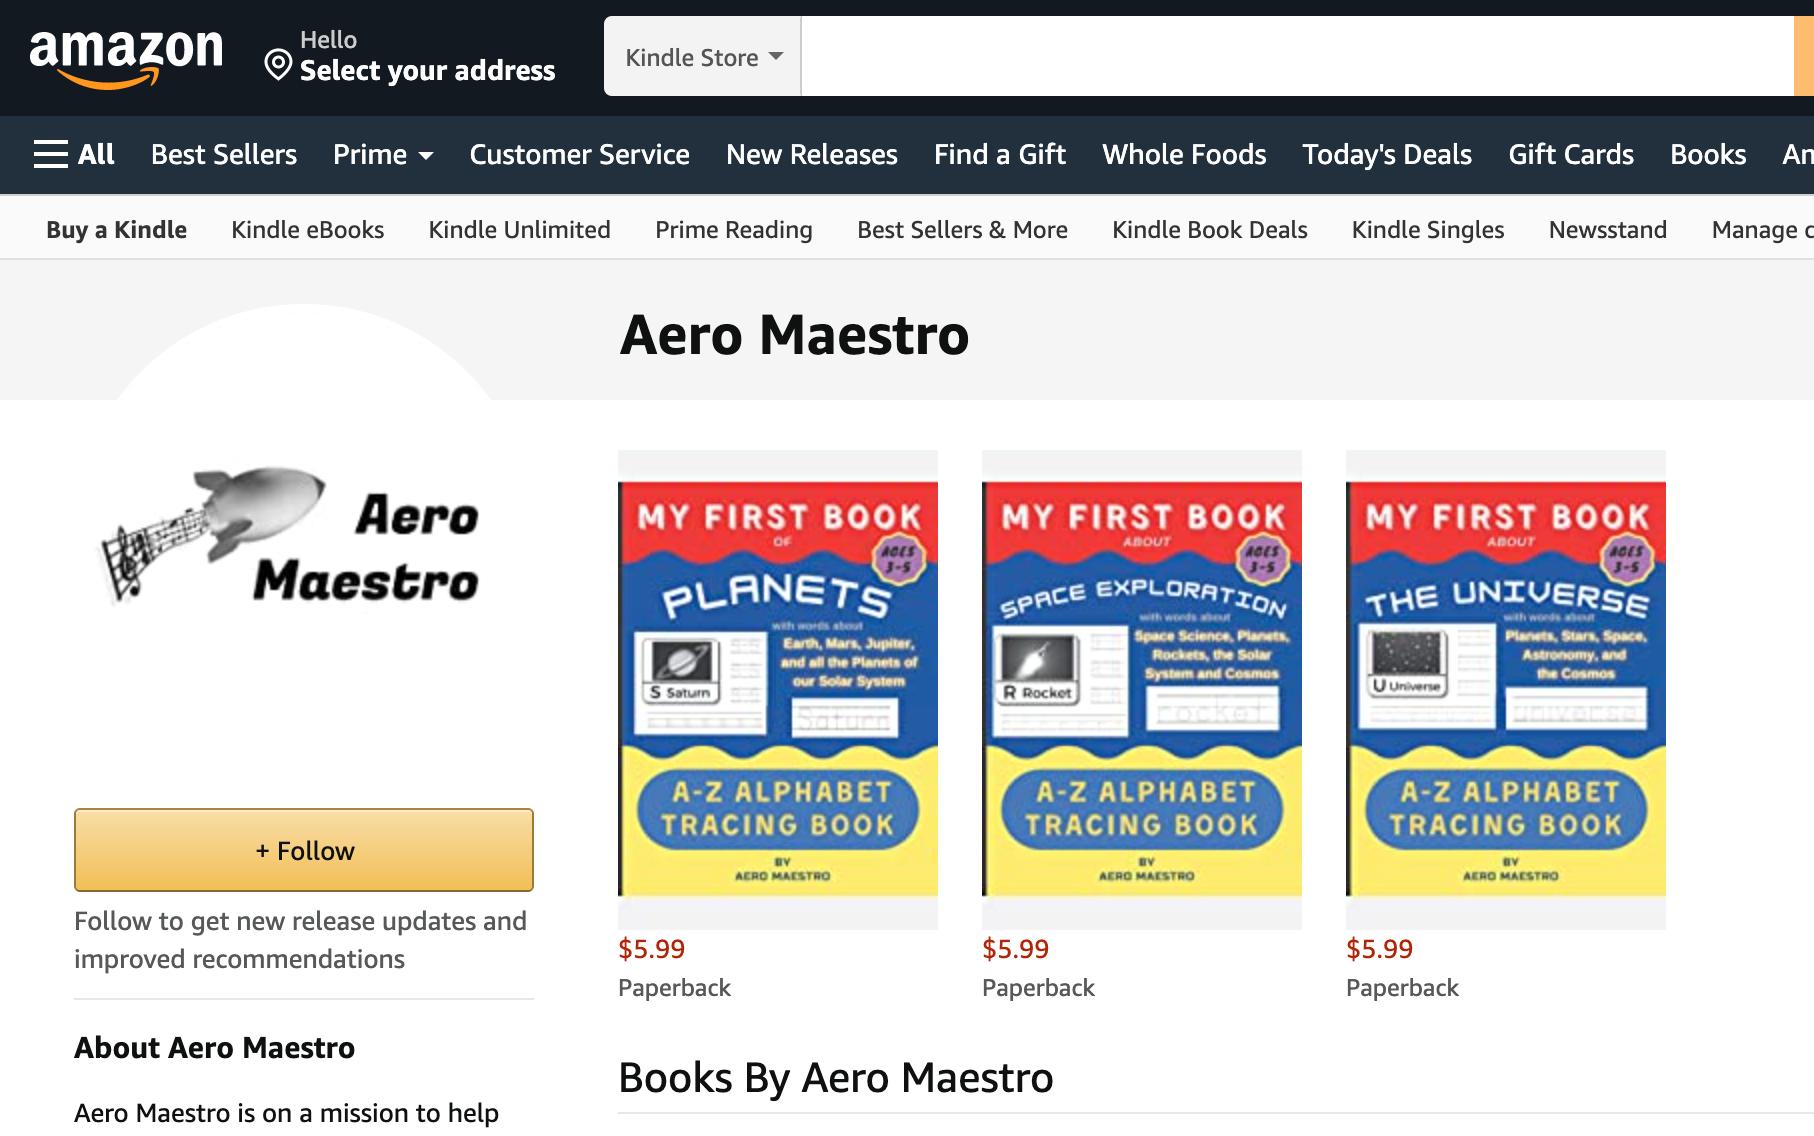 Aero Maestro author page on Amazon